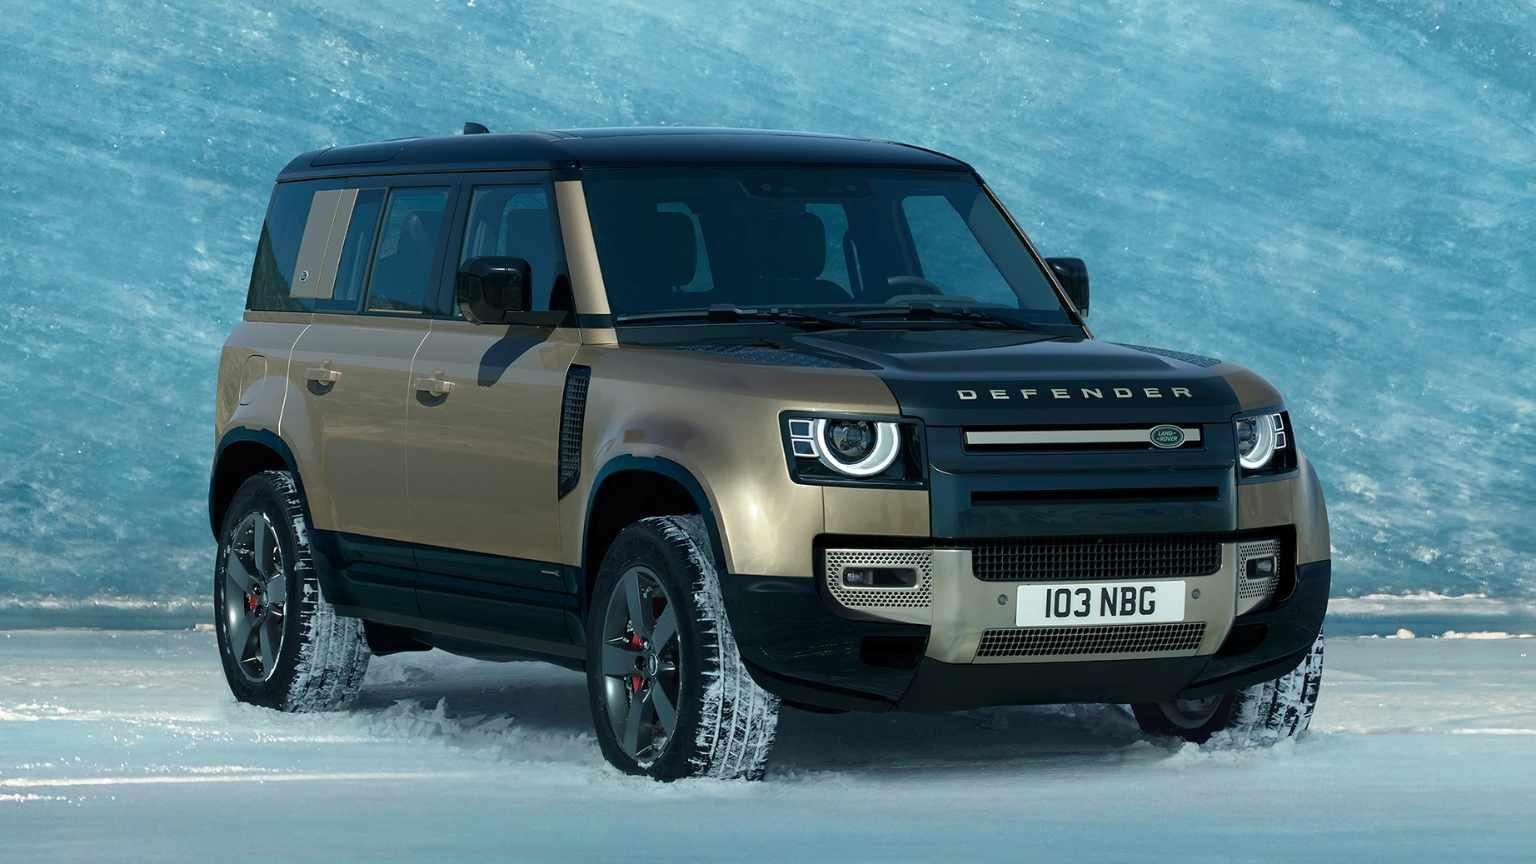 2020 Land Rover Defender SUV